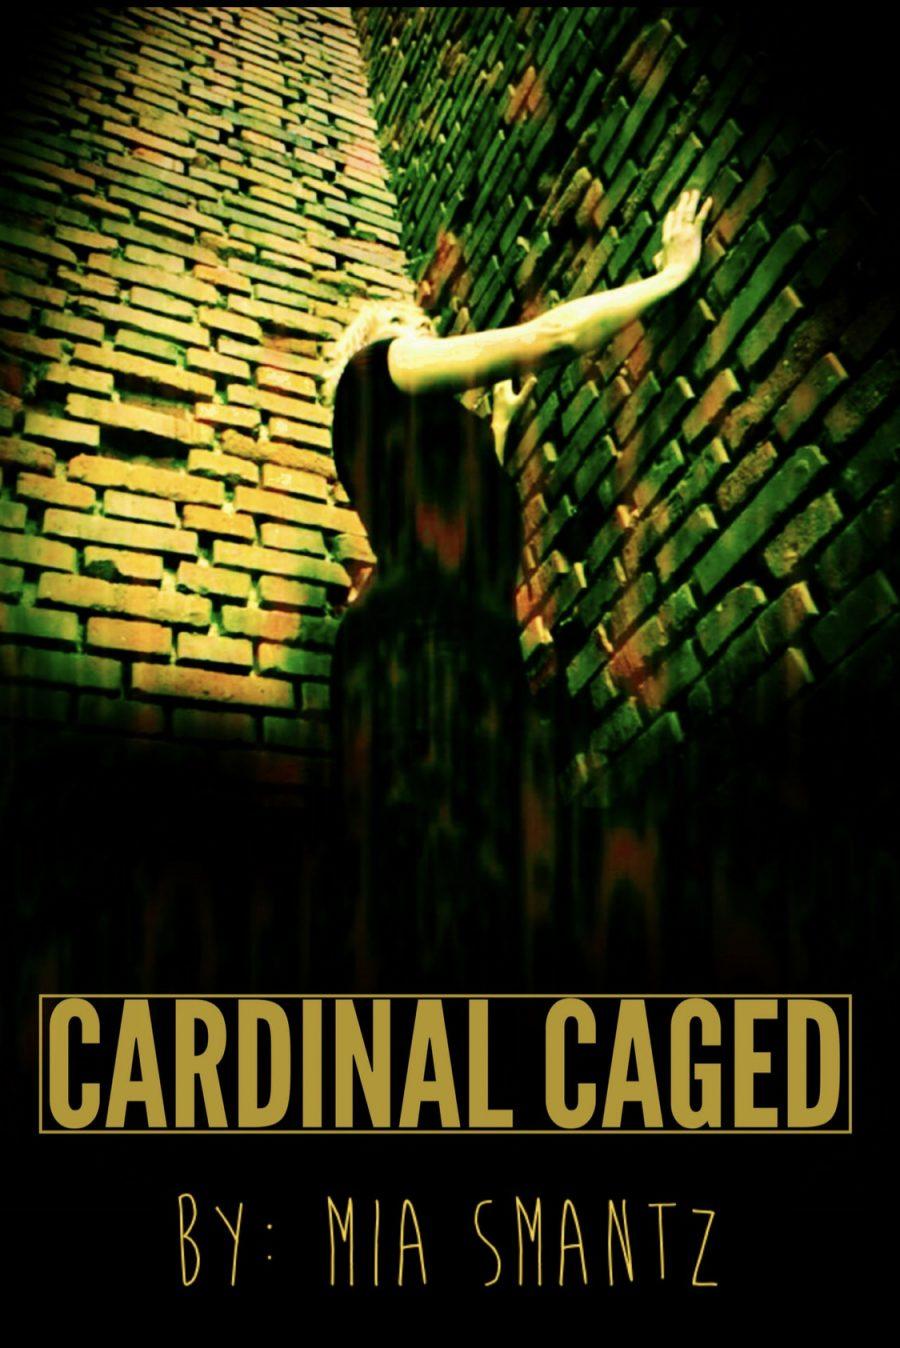 Cardinal Caged by Mia Smantz - A Book Review #BookReview #SlowBurn #RH #ReverseHarem #WhyChoose #SpyThriller #4Stars #KindleUnlimited #KU